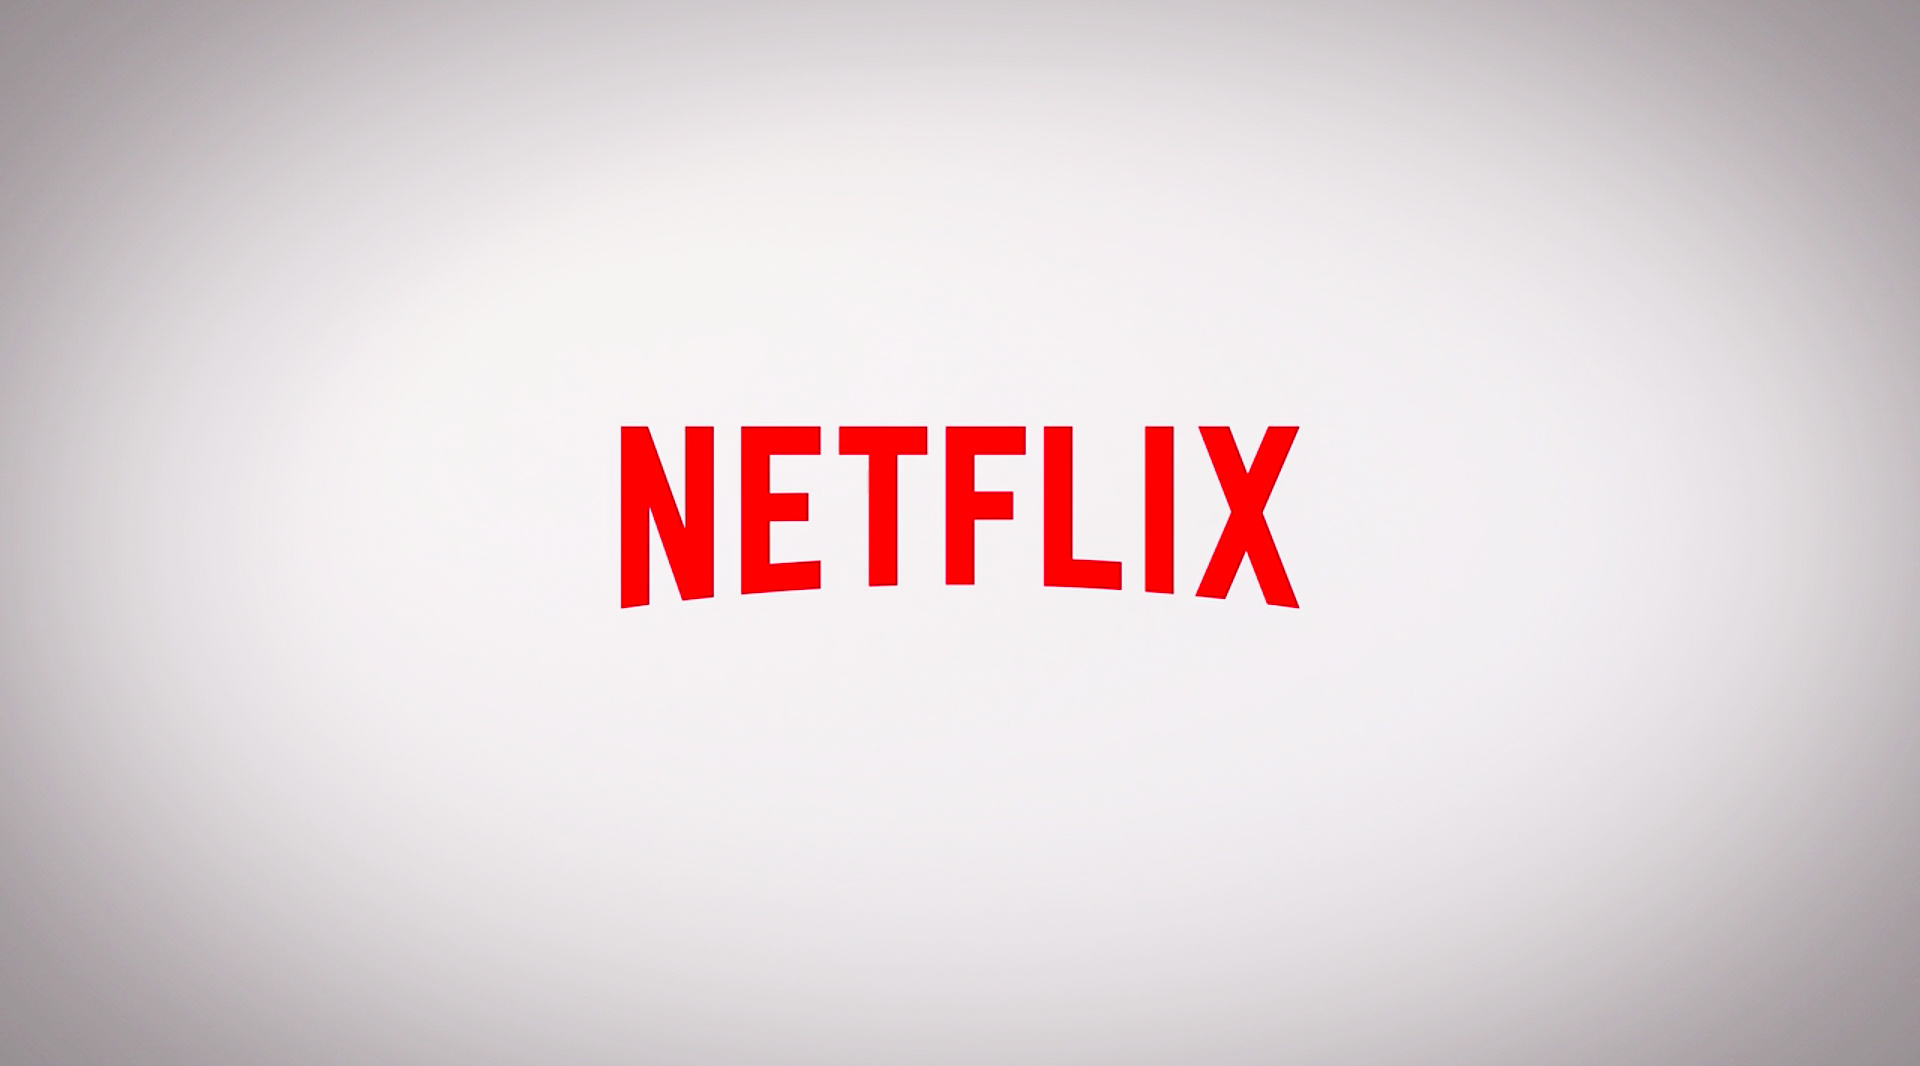 Zetflix — фильмы и сериалы от netflix